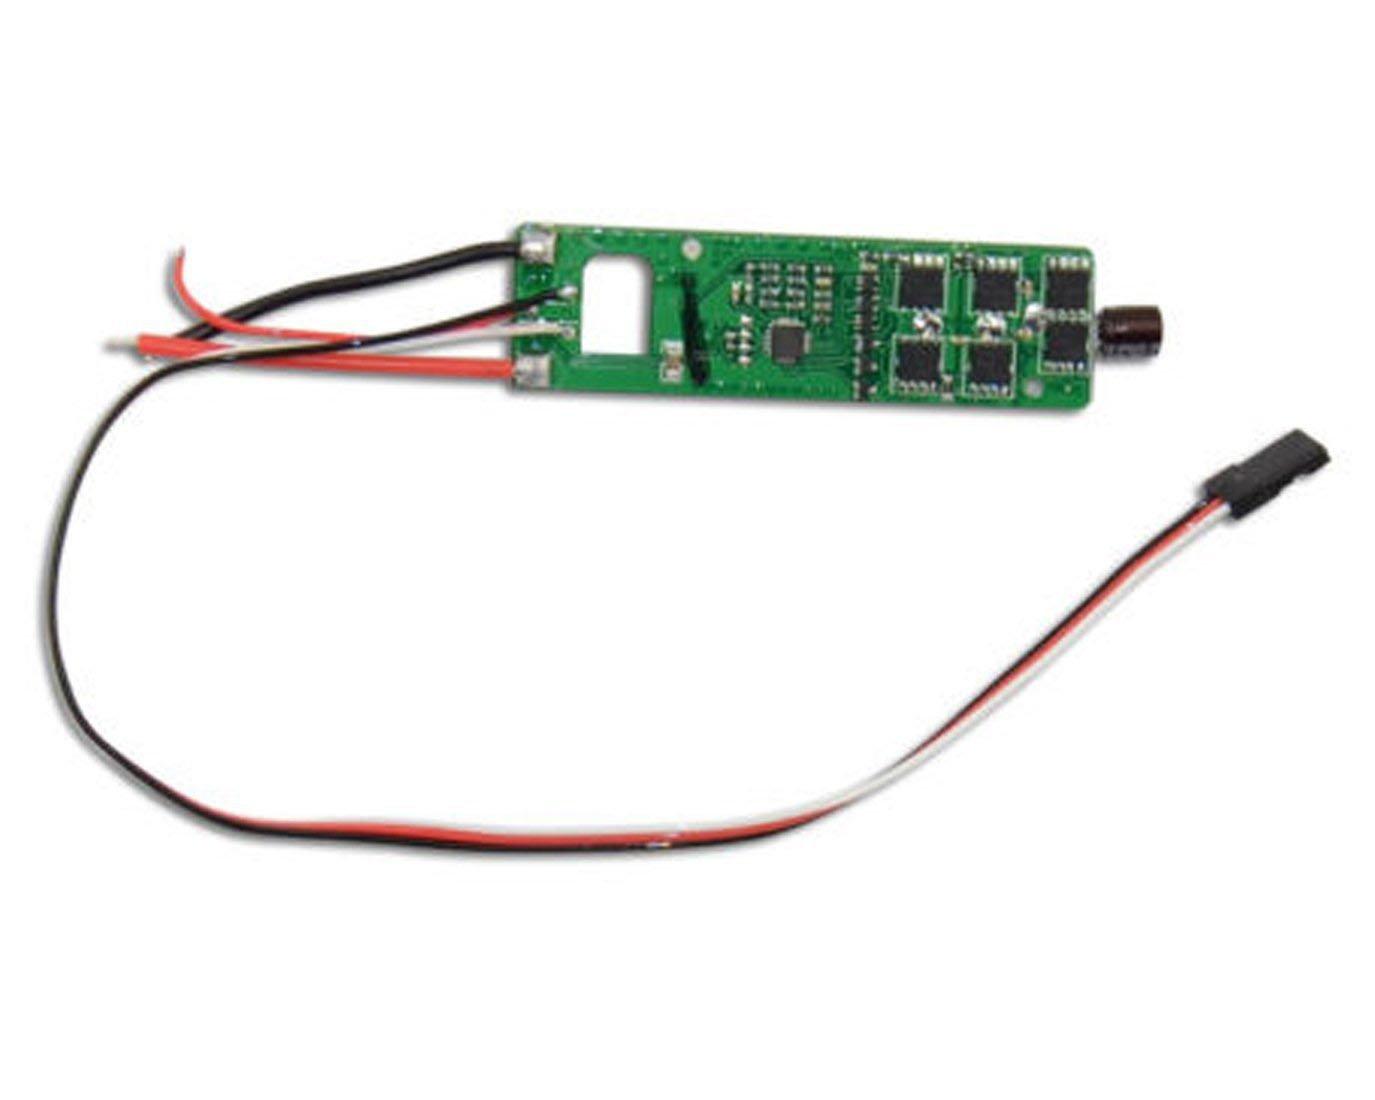 UUMART Cheerson CX-20 ESC Red Light Control System RC Quadcopter...